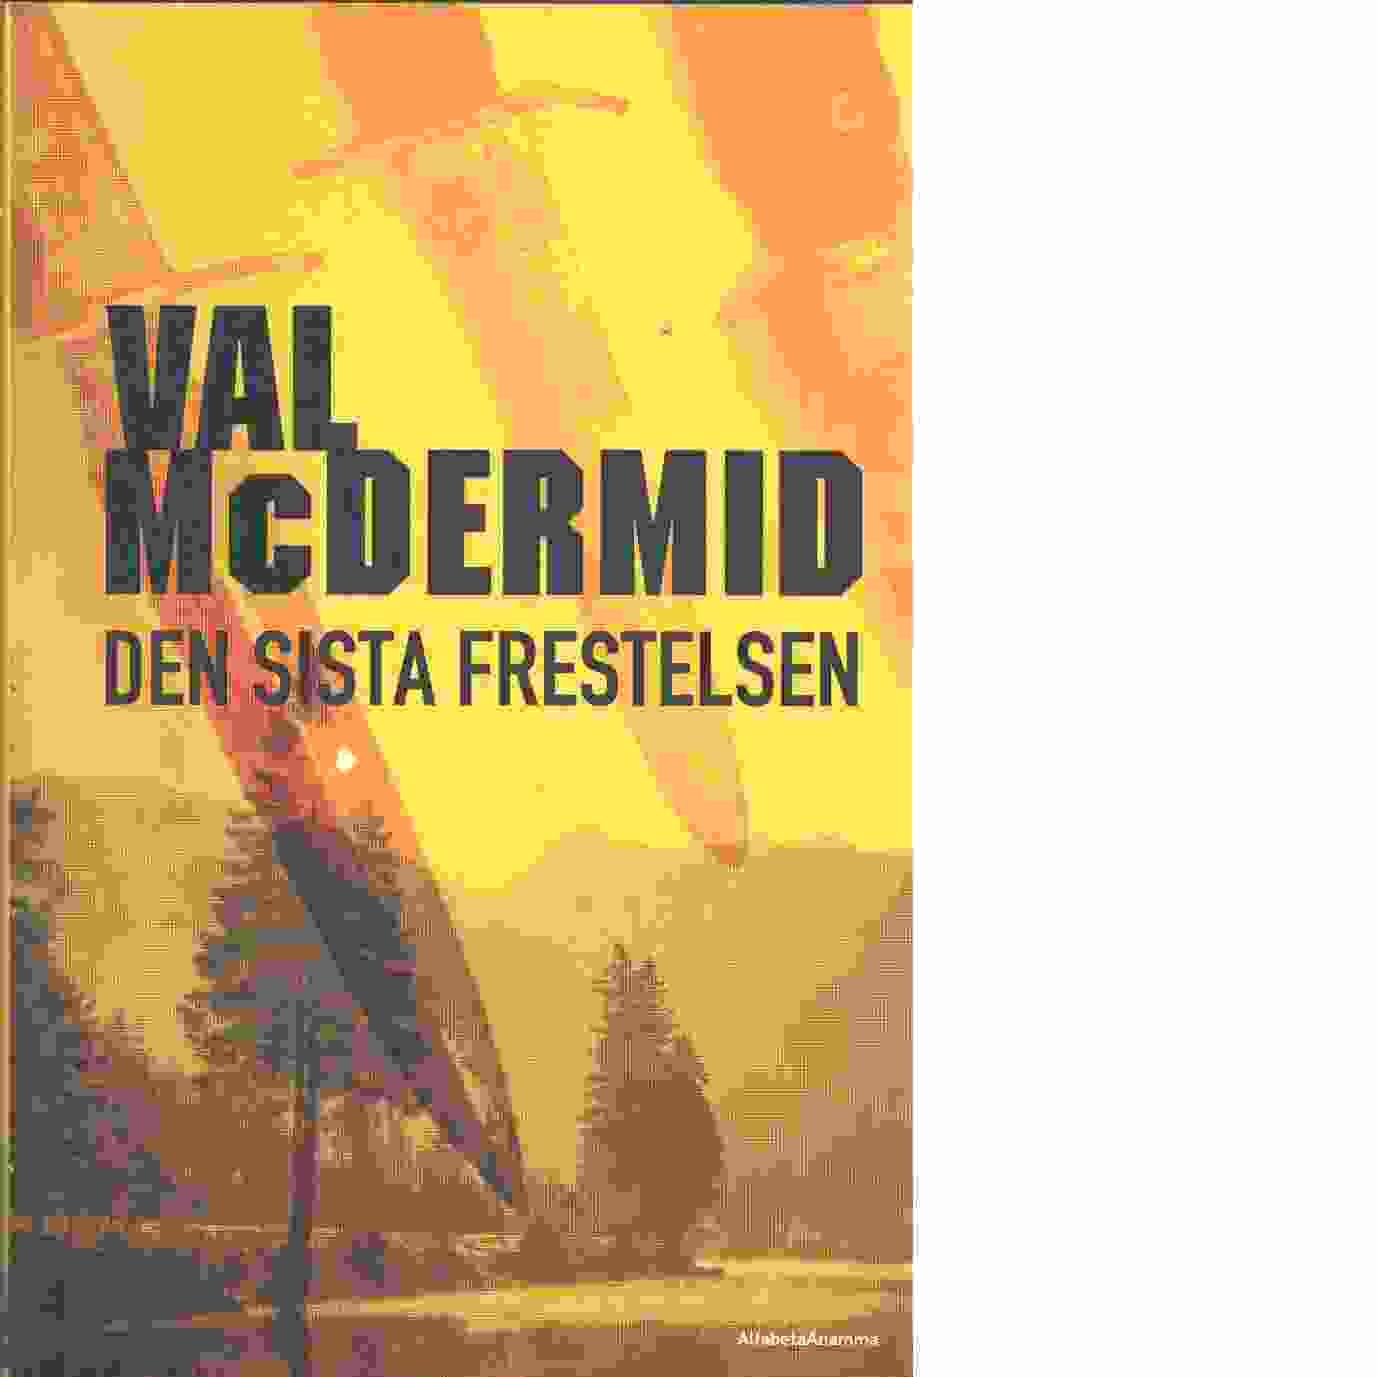 Den sista frestelsen - McDermid, Val